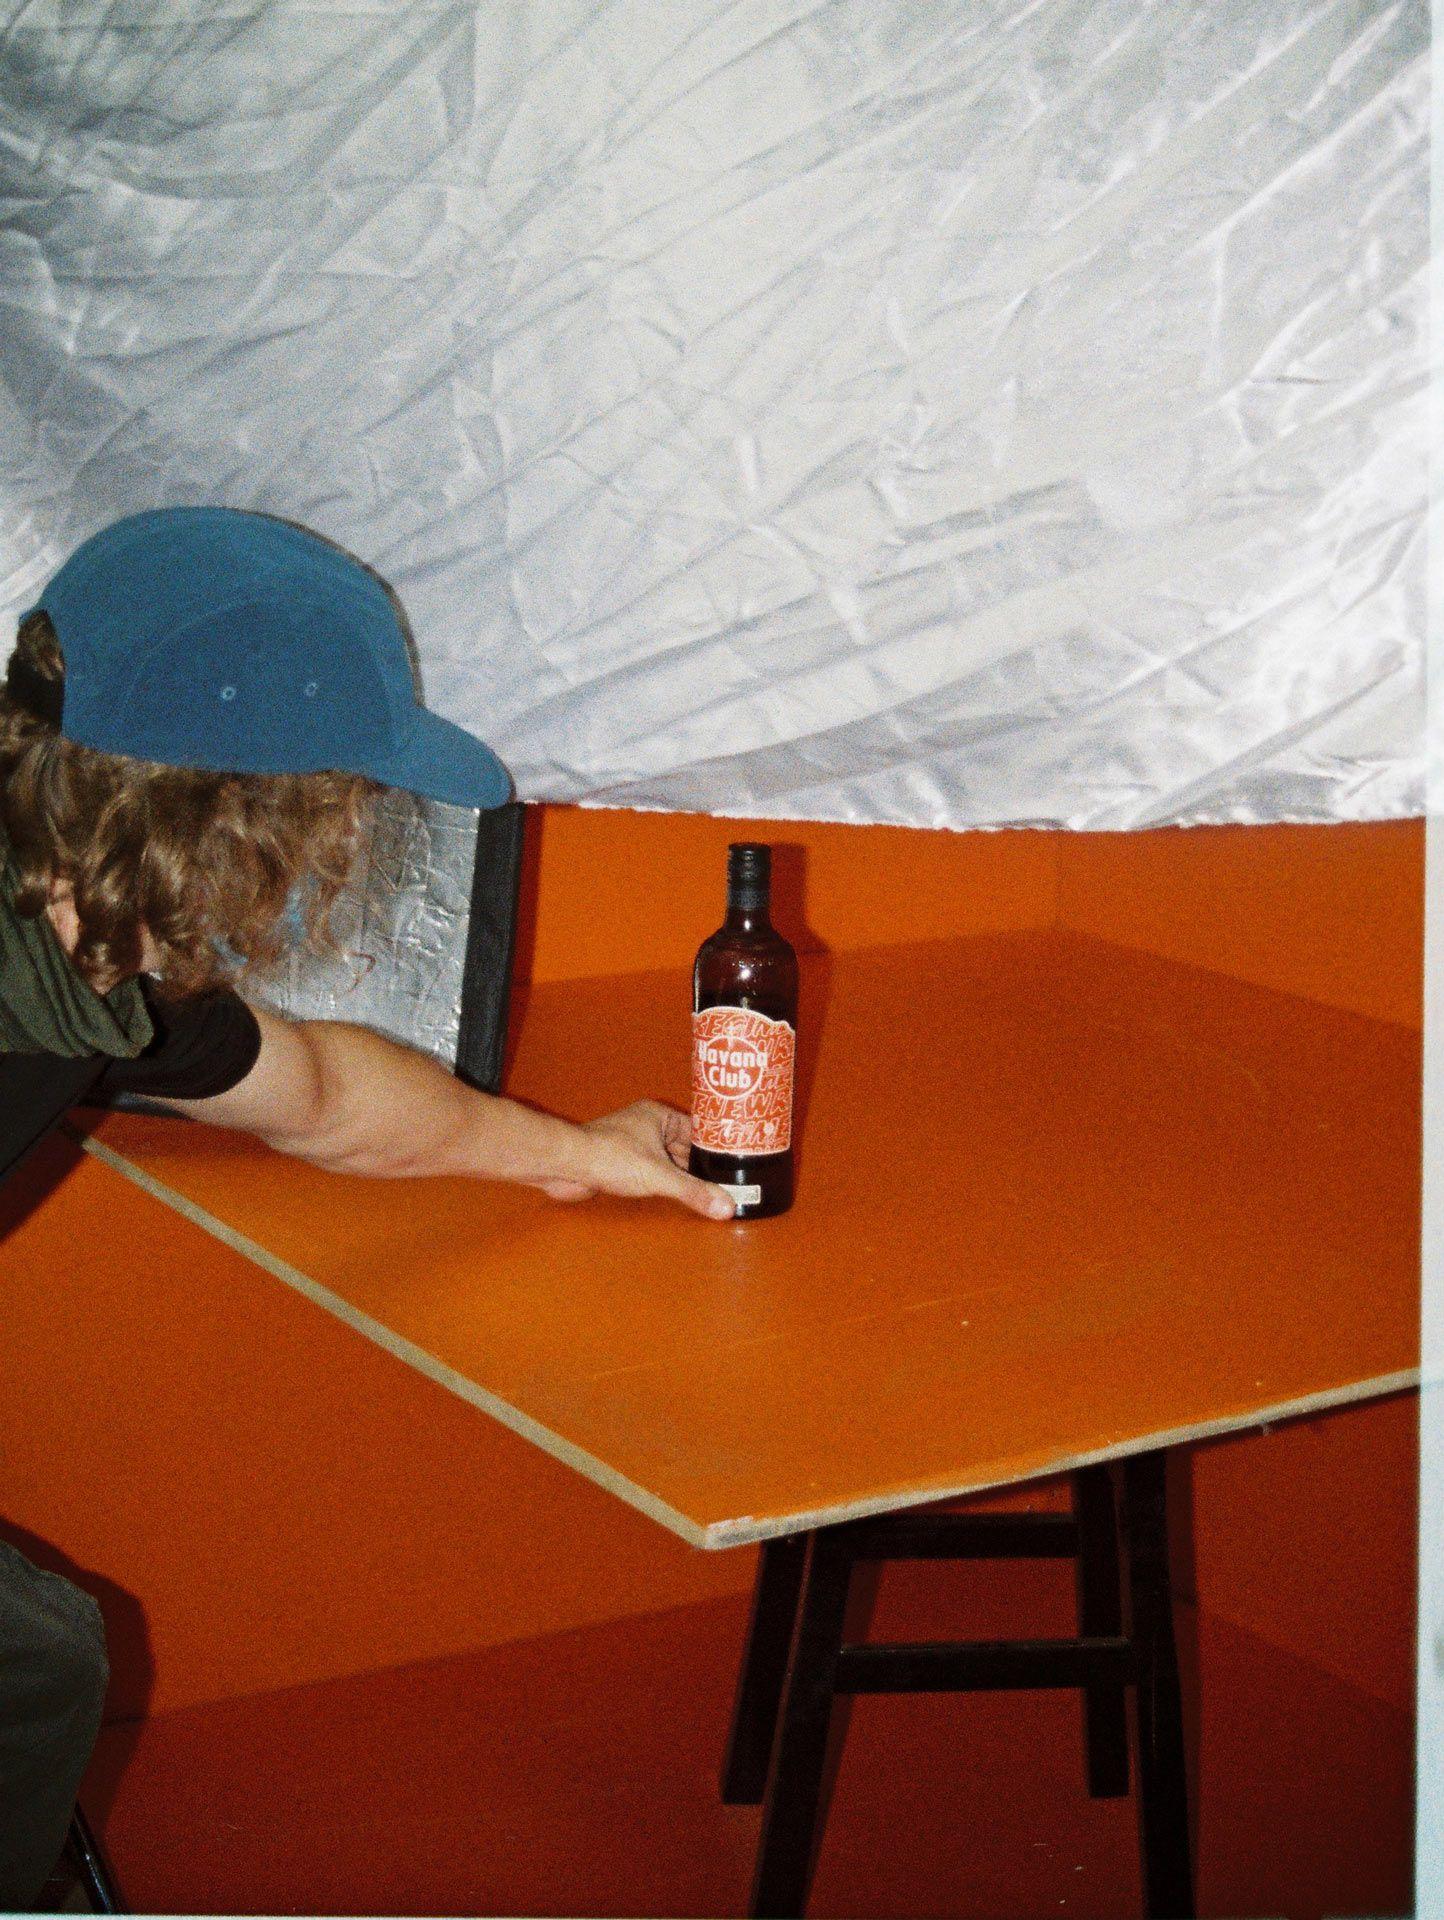 Vincent Ruel-Cote placing bottle of Havana Club brown rhum on orange background for video portrait filmed by Les Gamins for collaboration between Atelier New Regime and Havana Club